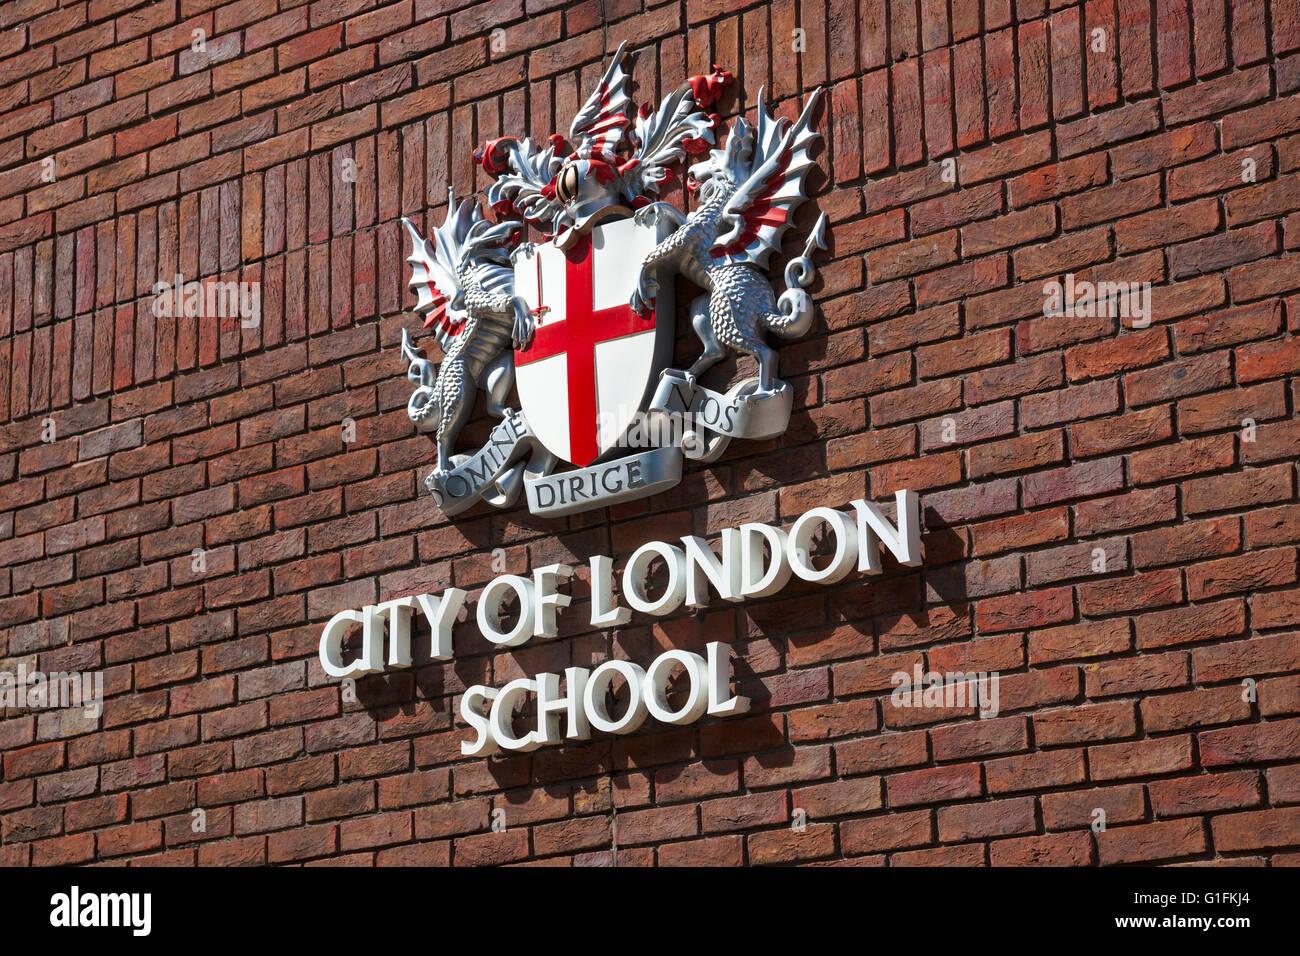 City of London School emblem - Stock Image